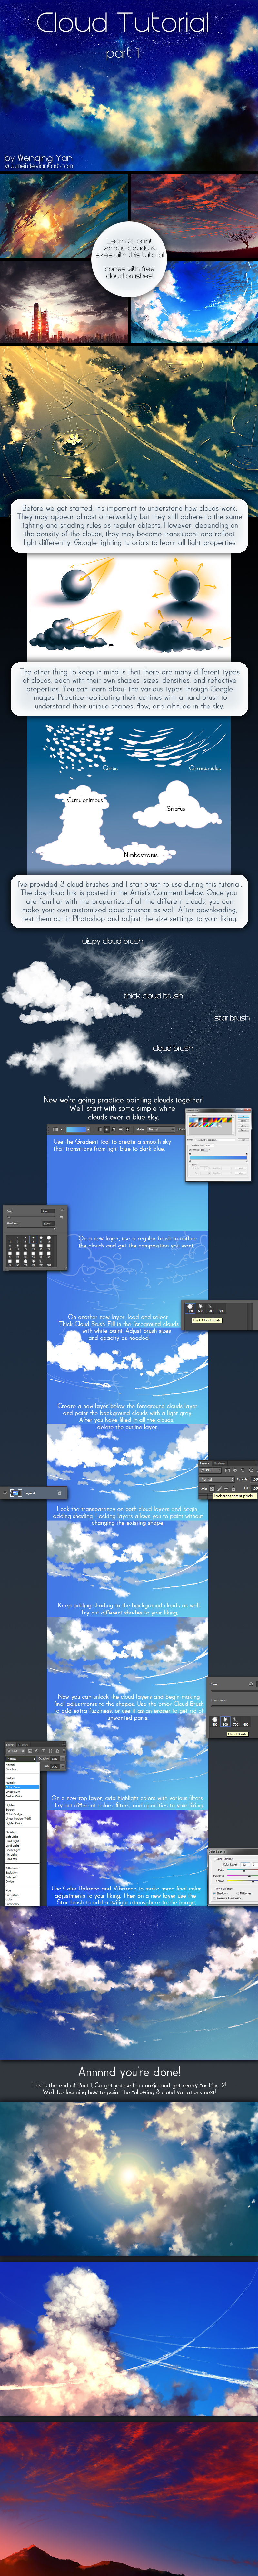 Cloud Tutorial Part 1